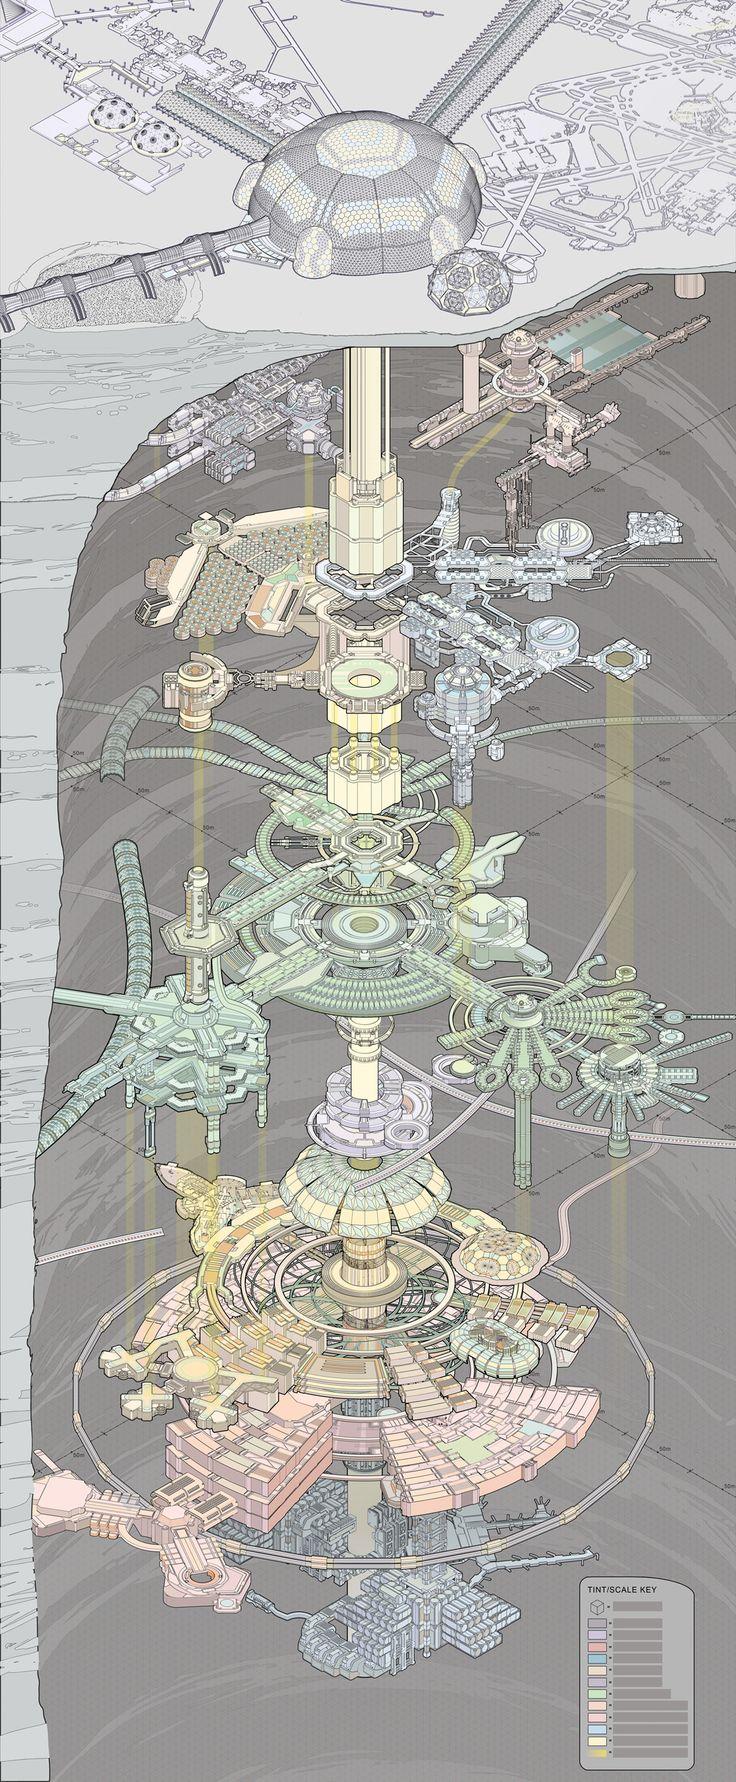 Netrunner Cutaway Diagram By Zirngibl On Deviantart  With Images